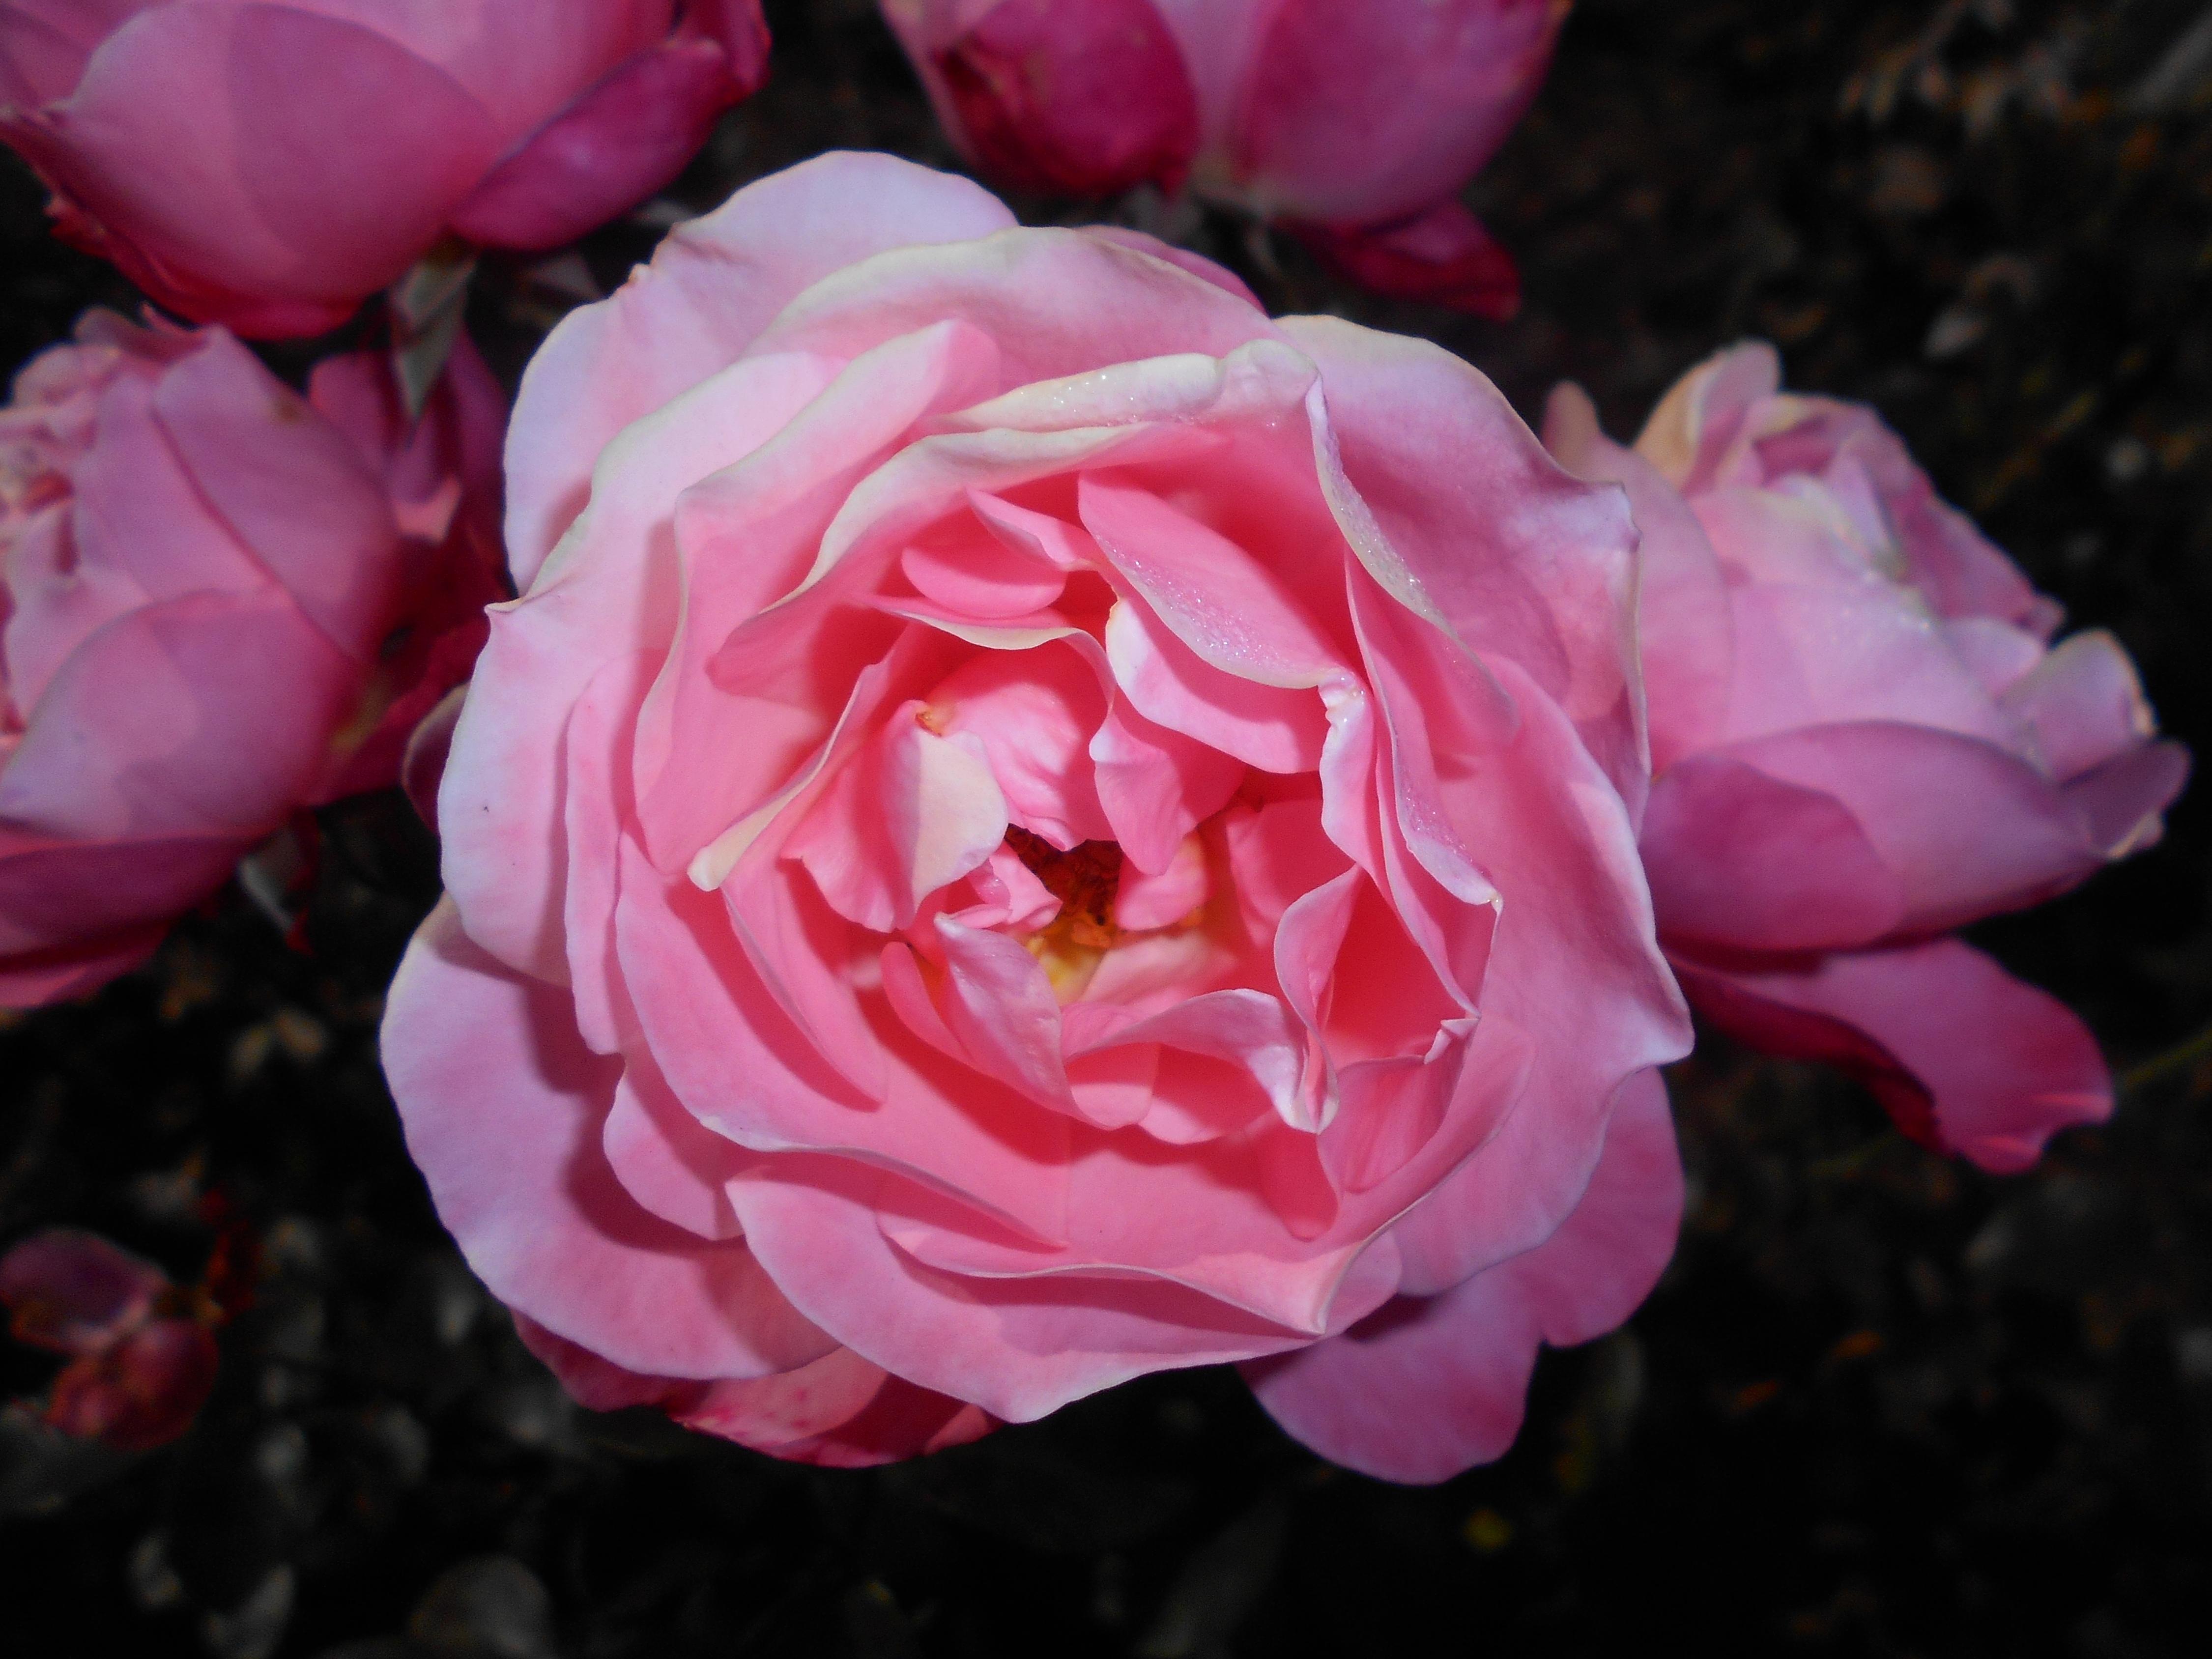 Filerosa Mein Schoner Garten 2017 10 02 6762jpg Wikimedia Commons